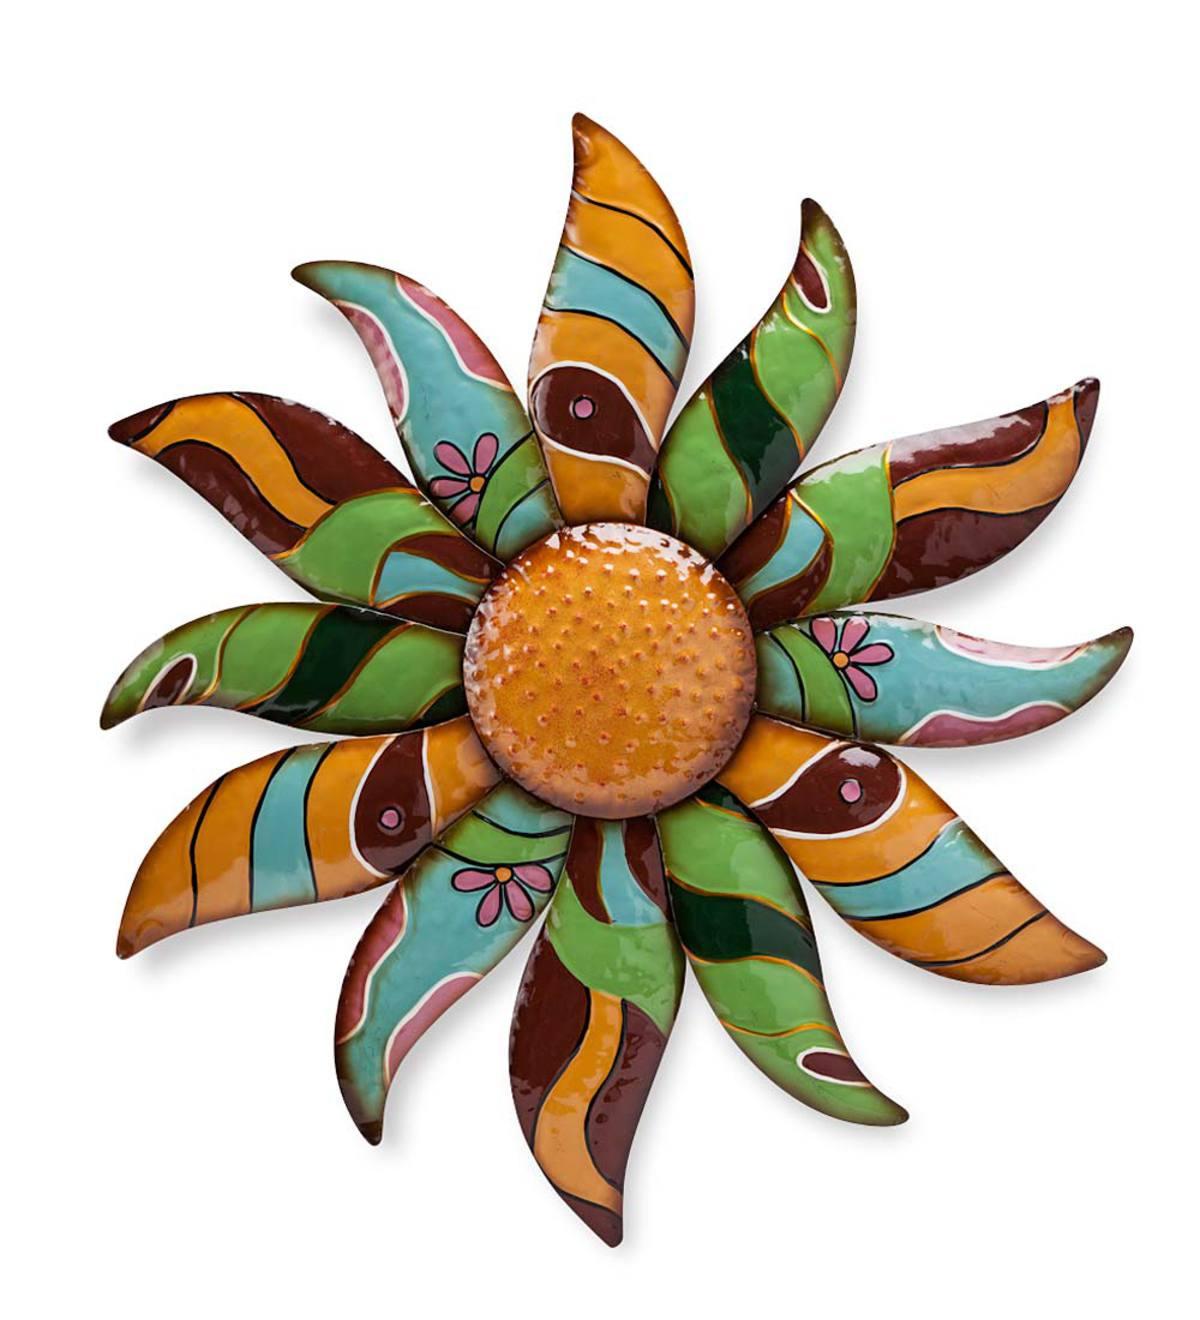 Talavera Painted Metal Flower Wall Art Plowhearth